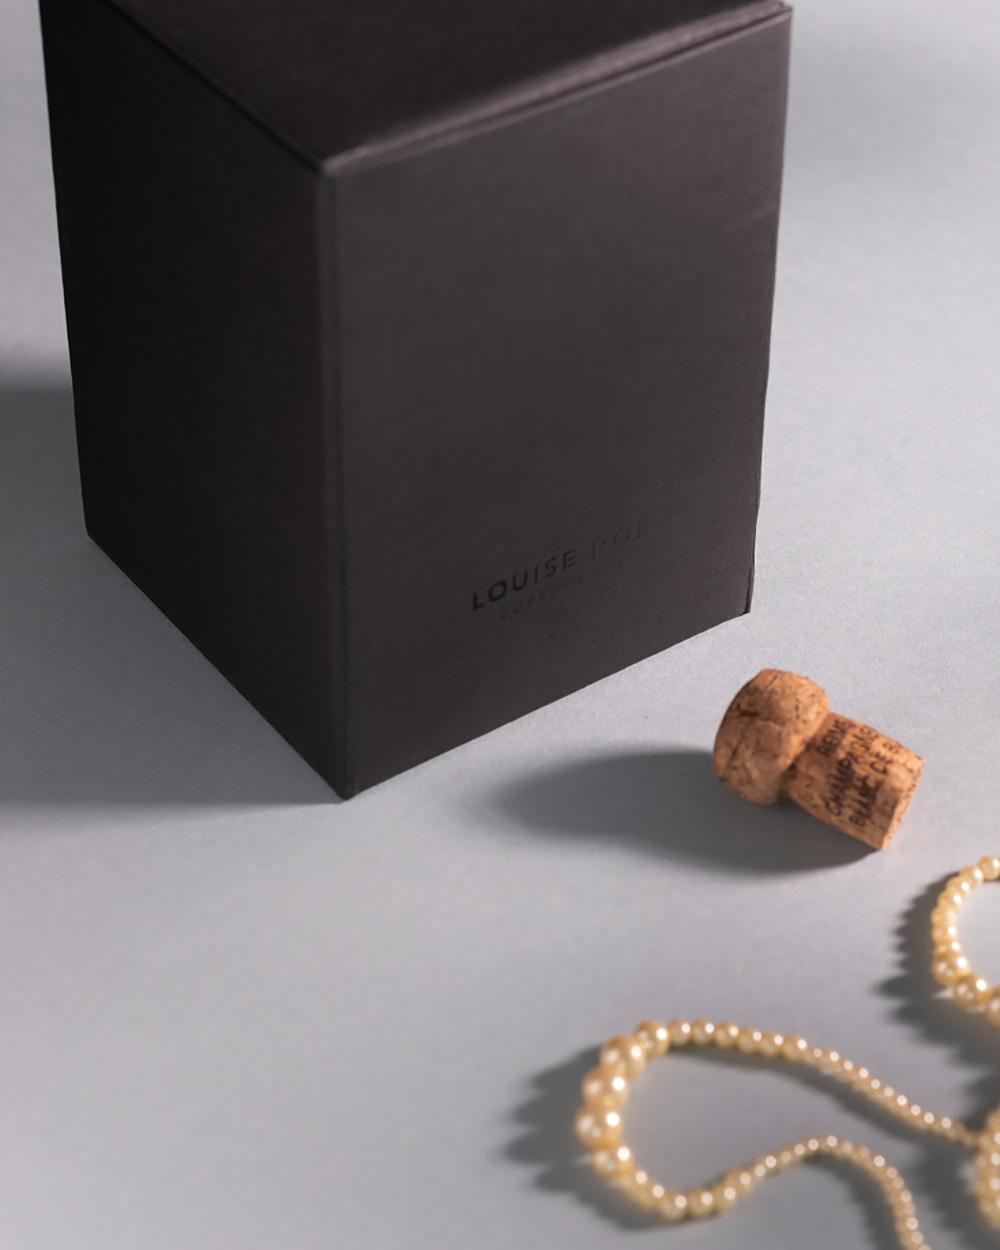 lousie roe produktfoto design mats dreyer fotograf oslo